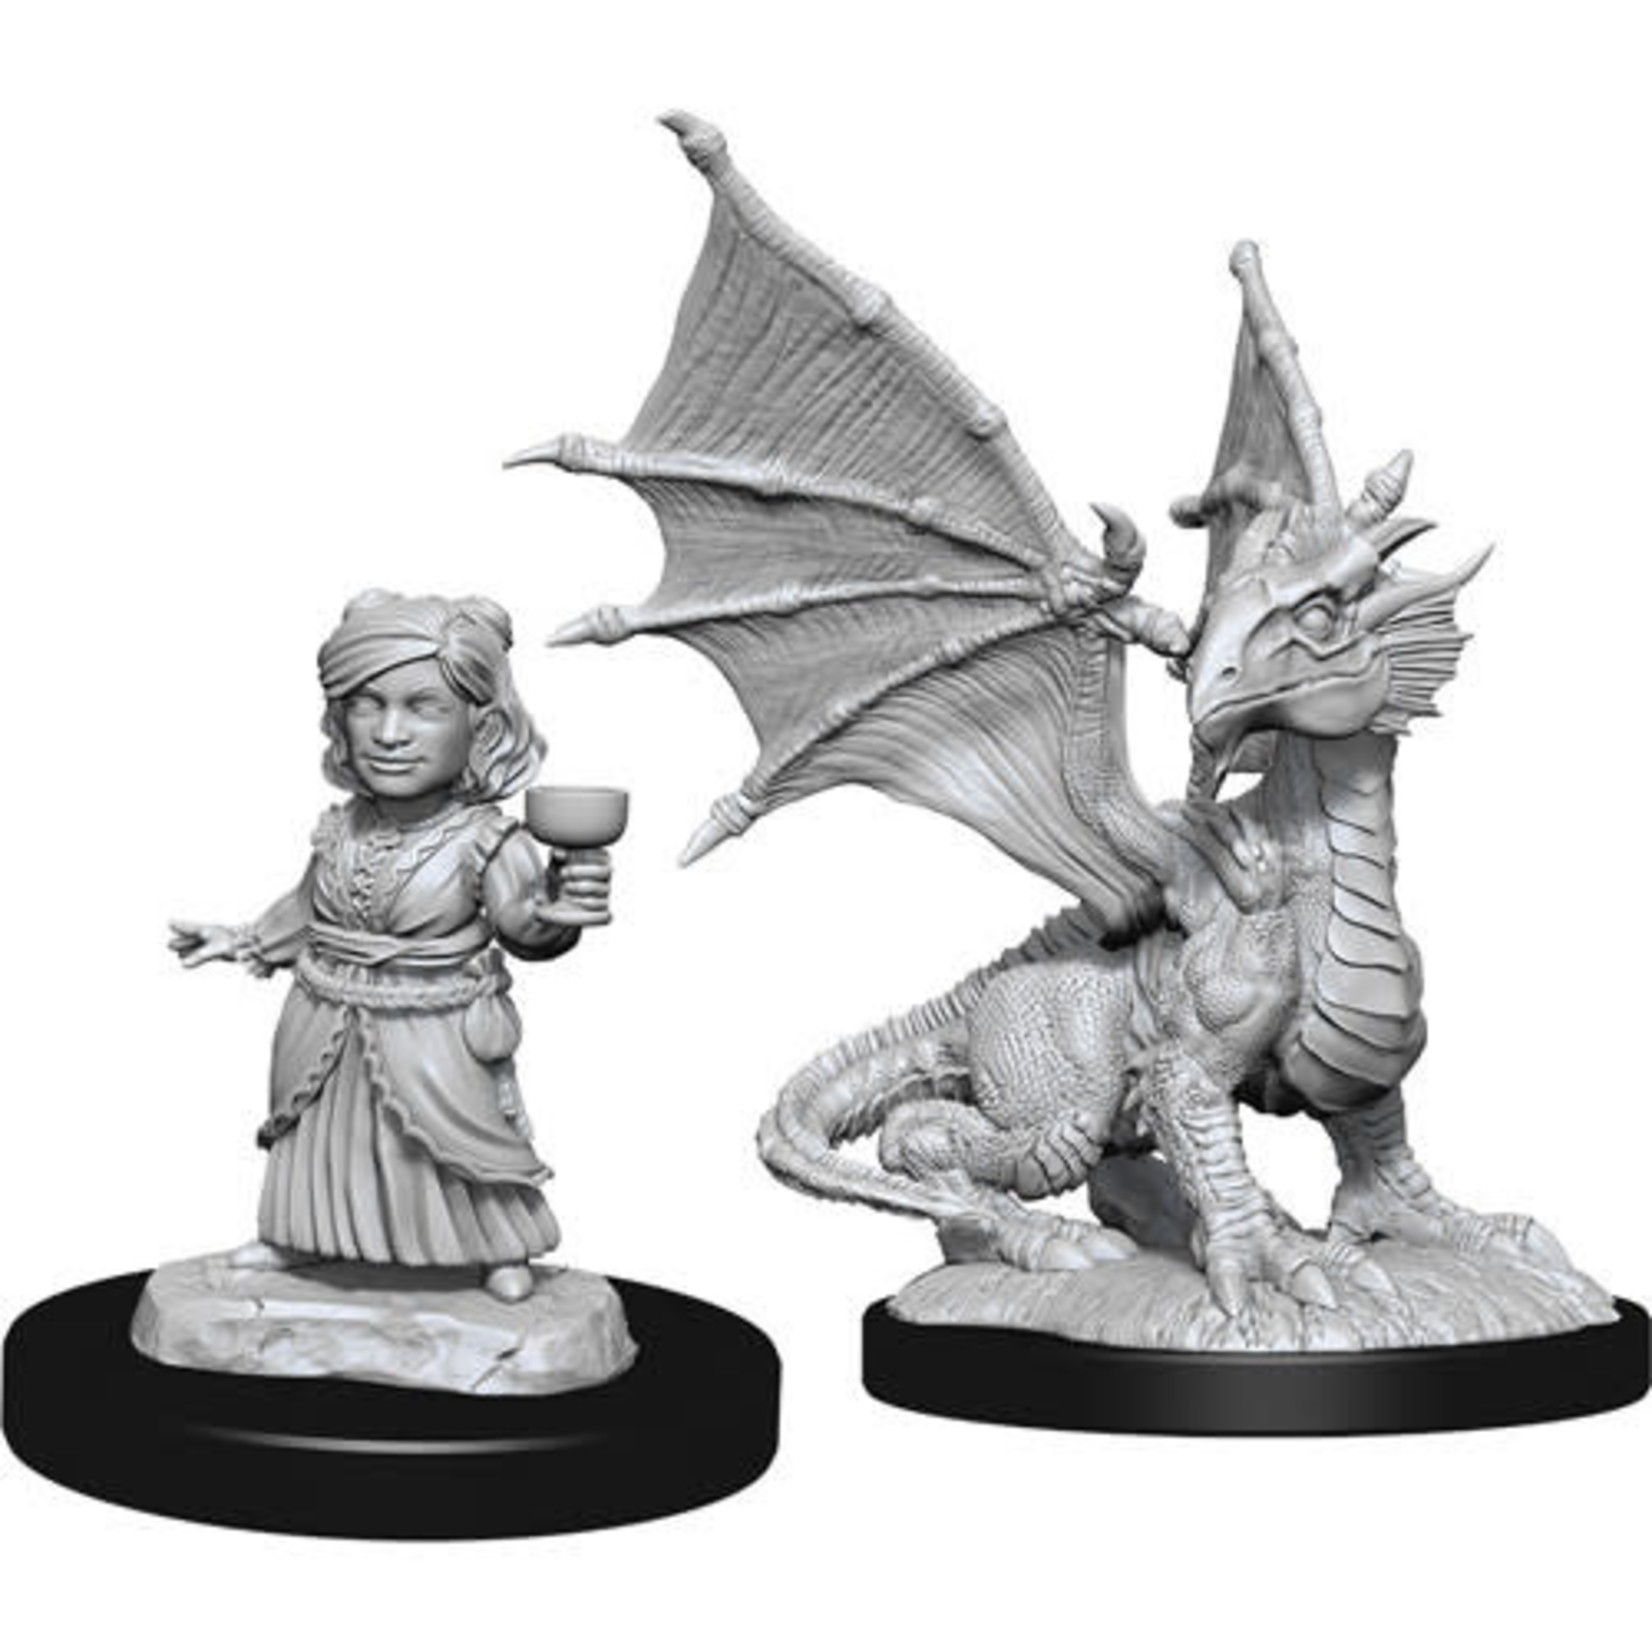 D&D Unpainted Minis: Silver Dragon Wyrmling & Halfling Dragon Friend (Wave 13)